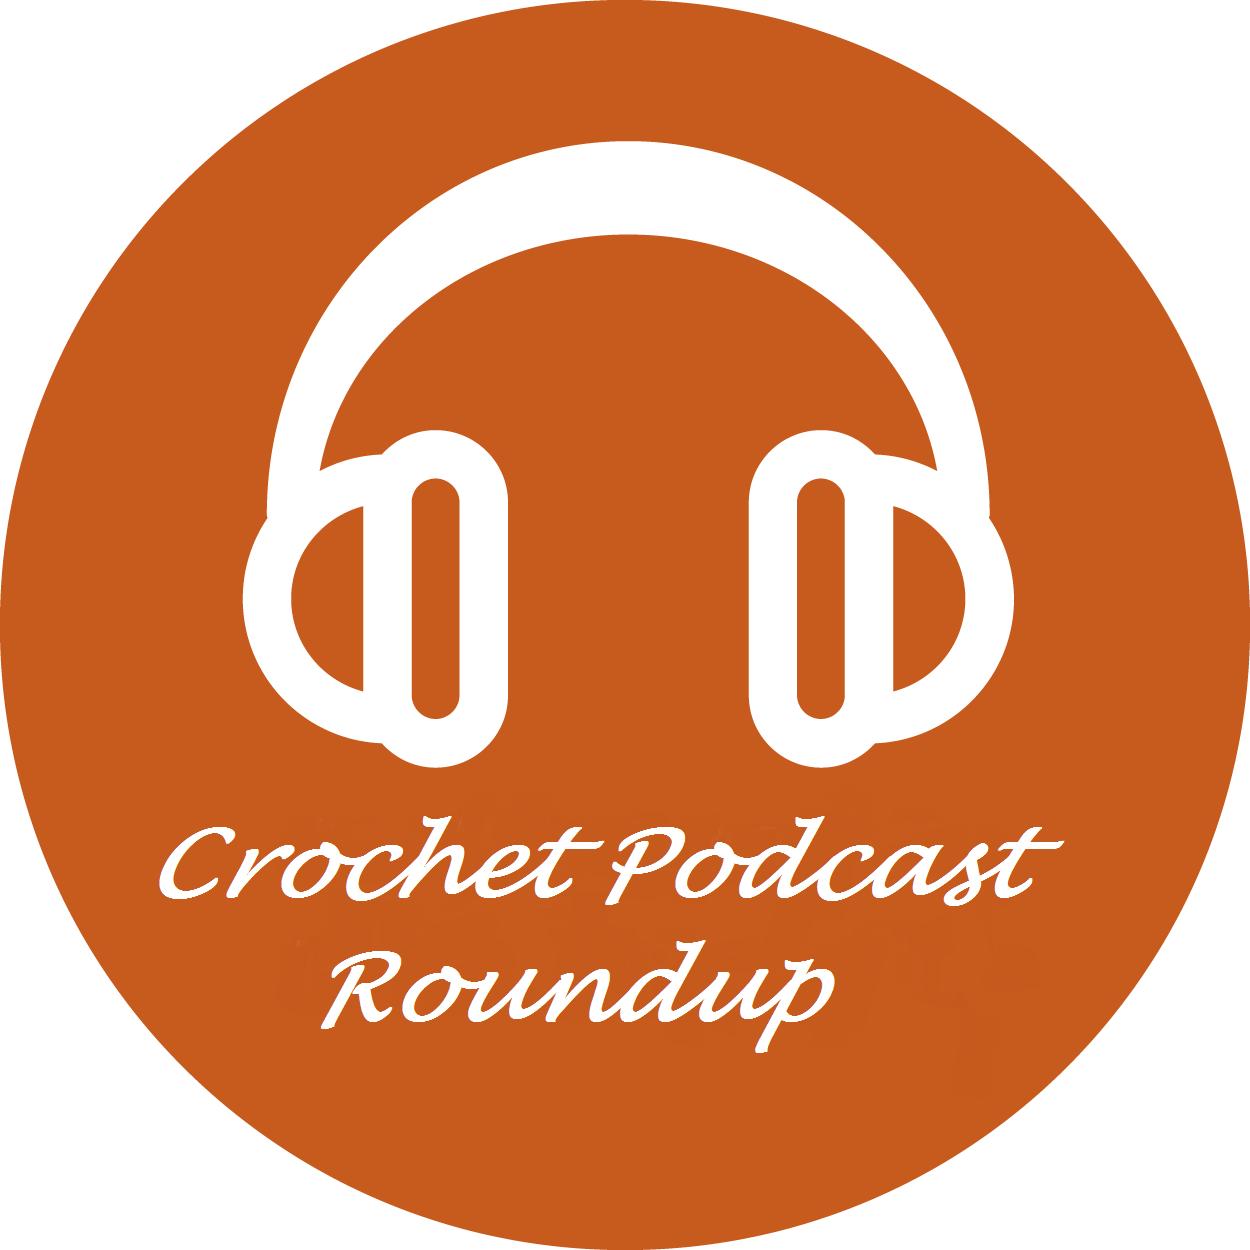 Crochet Cakes Podcast